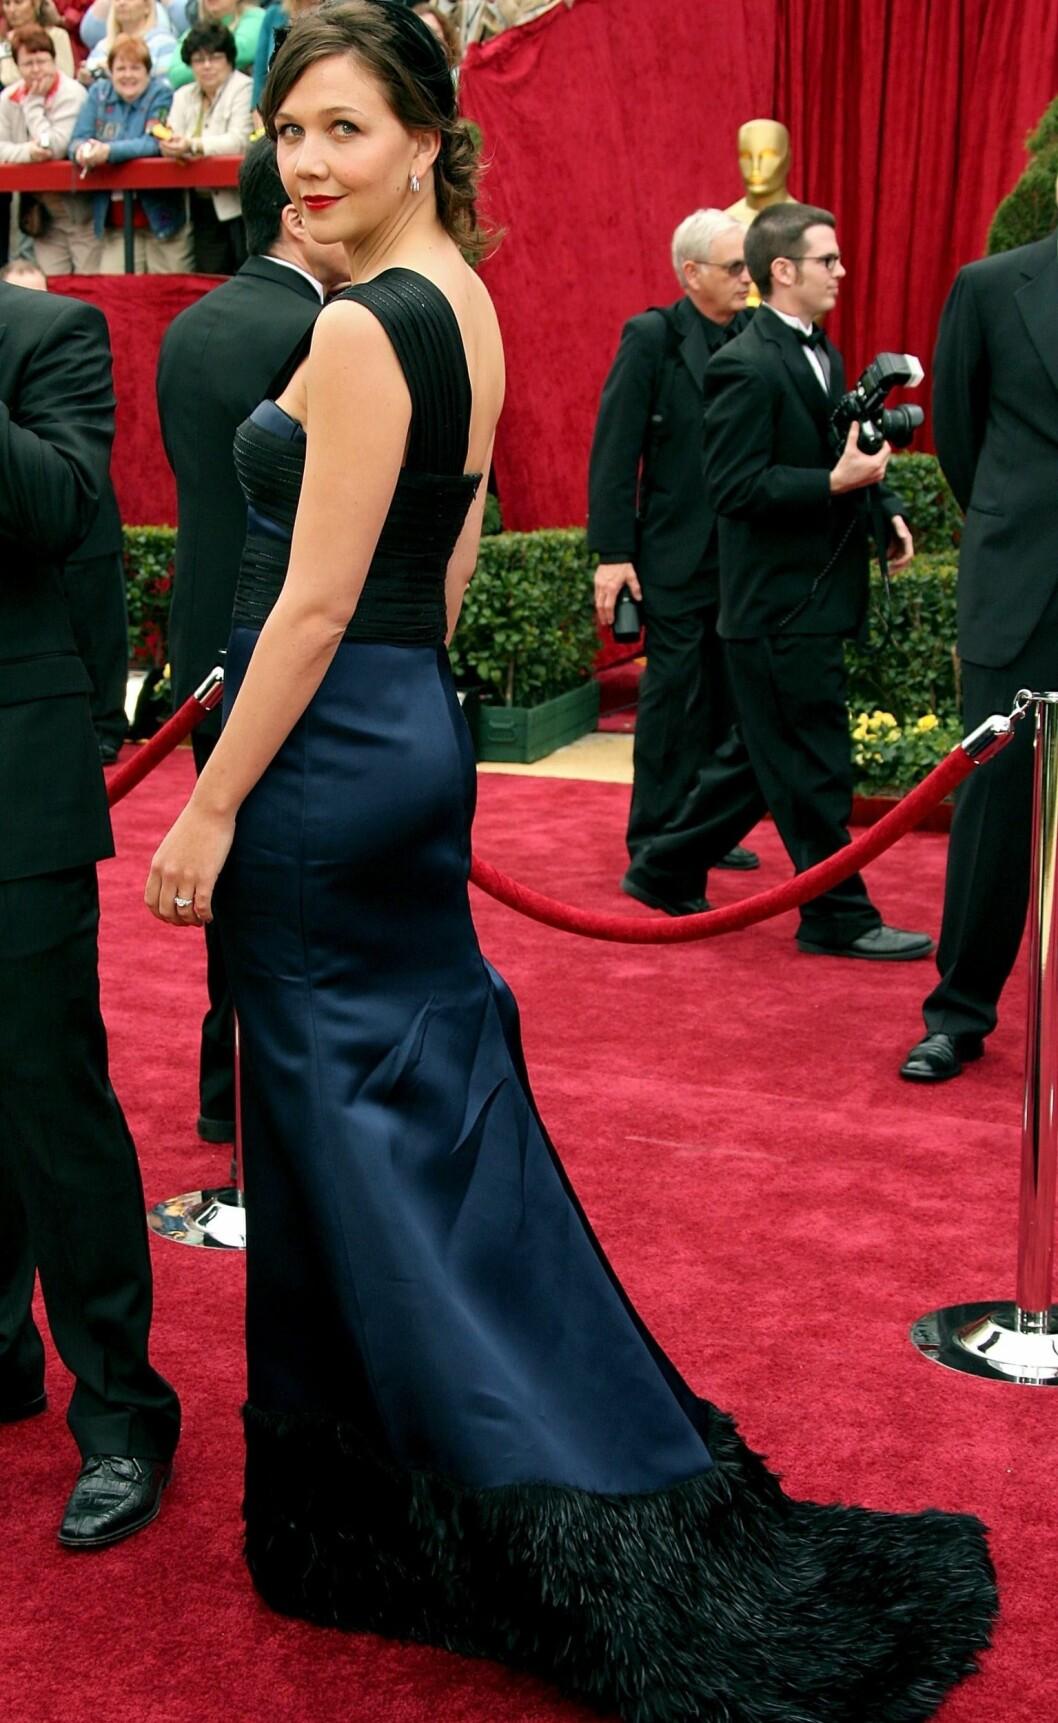 På Oscar-utdelingen i 2007 kom Maggie i en fotsid havfruekjole med slep av fjær. Foto: All Over Press